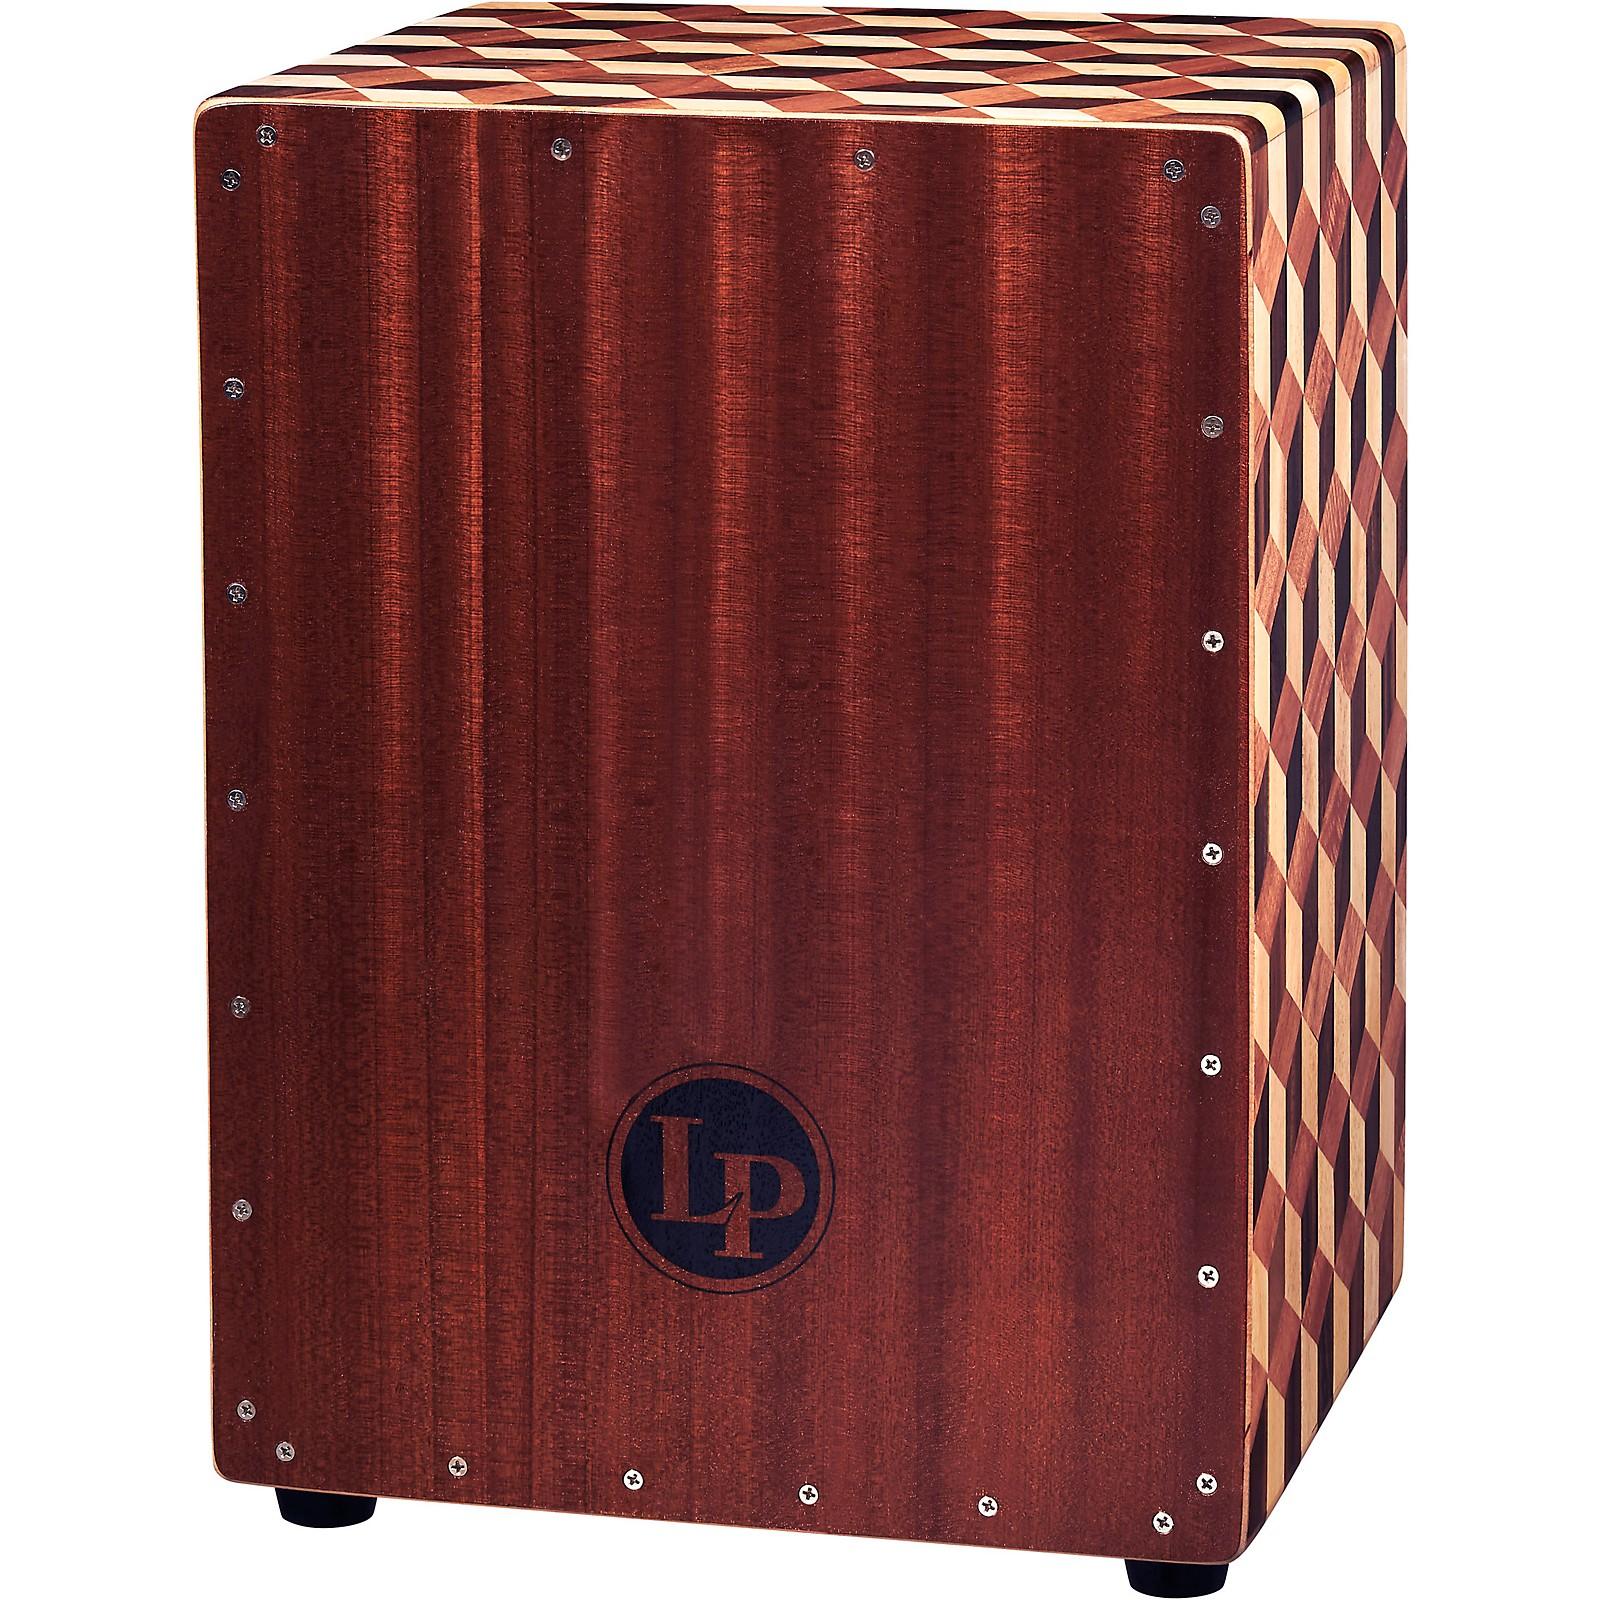 LP 3D Cube String Cajon with Bag